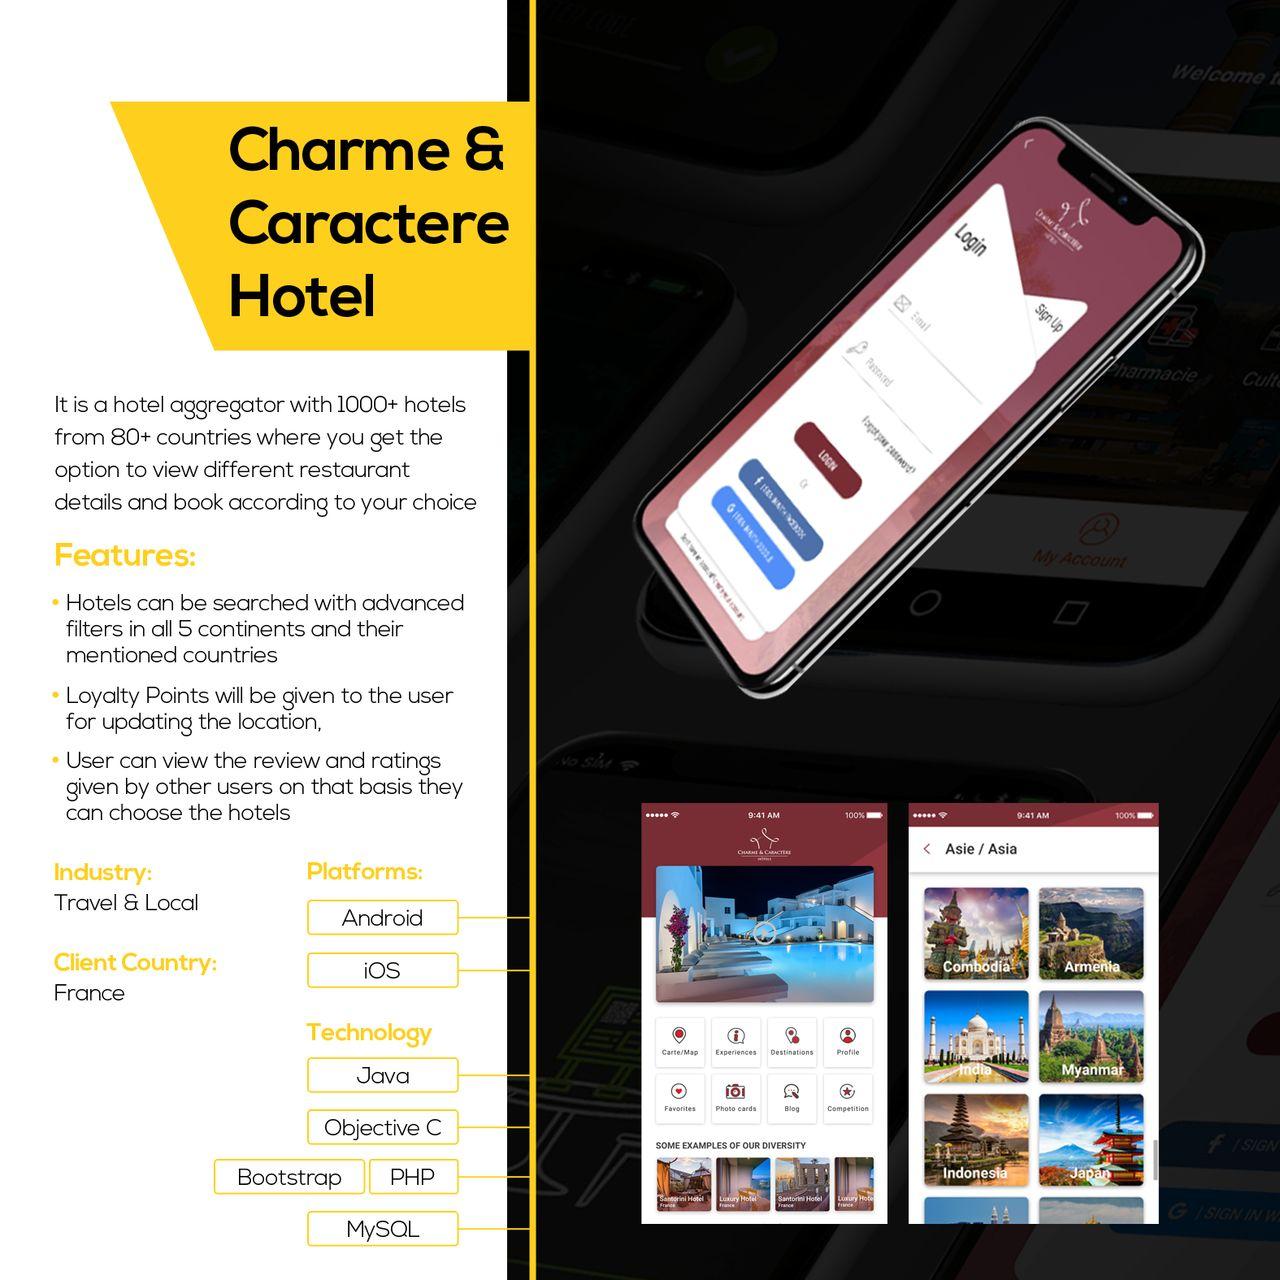 Charmes & Caractere